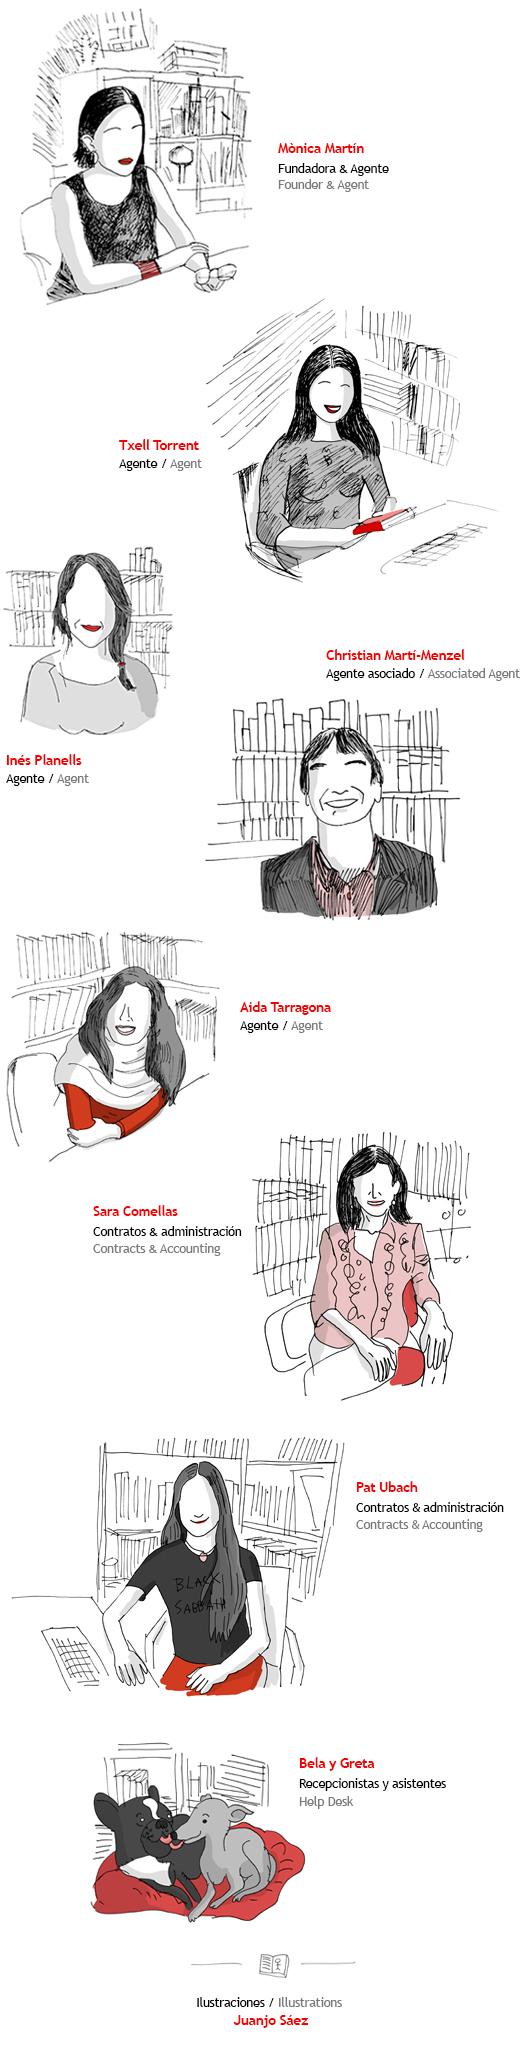 Equipo de MB Agencia Literaria